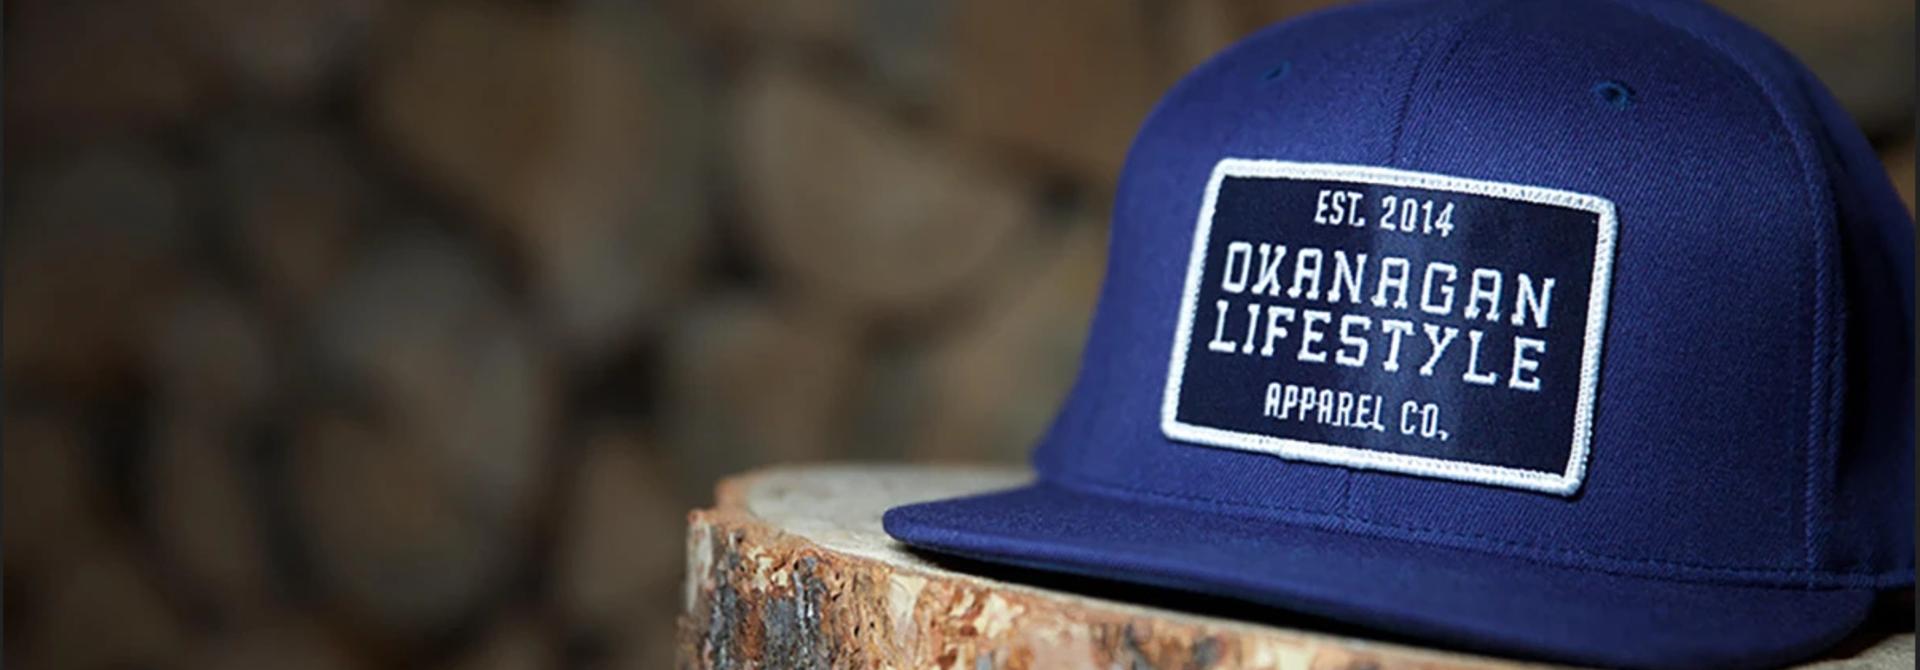 Okanagan Lifestyle